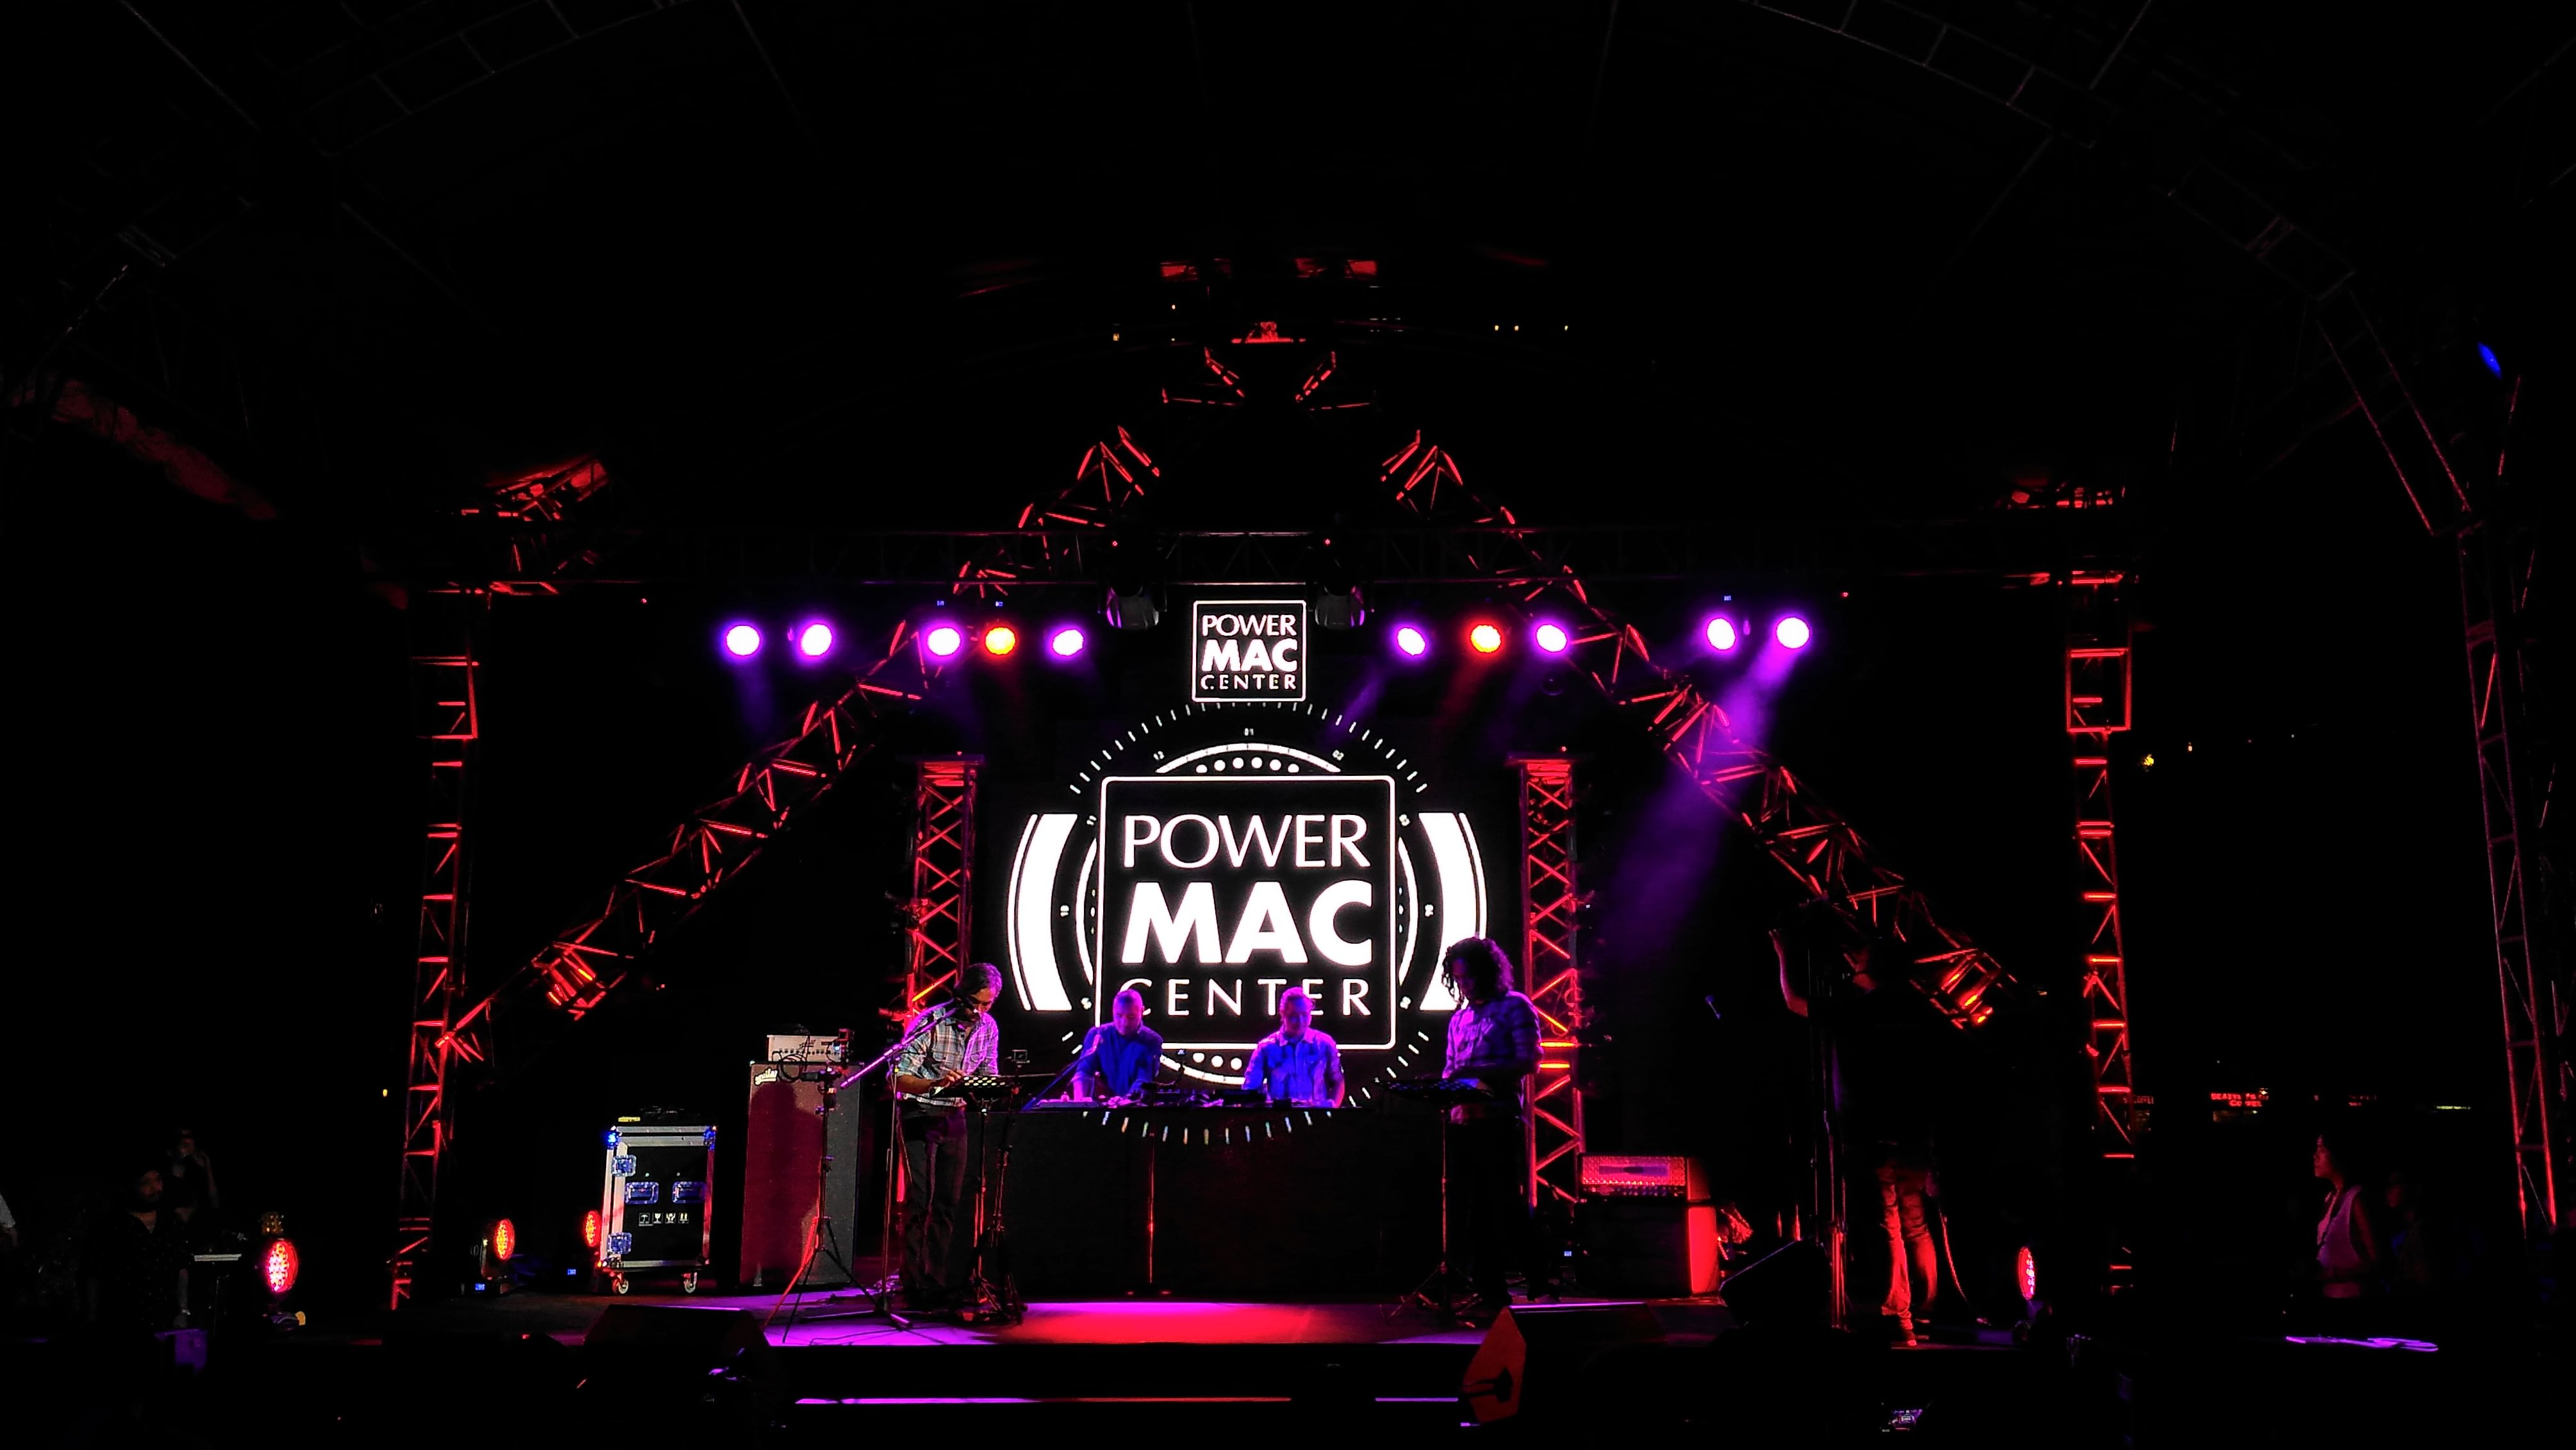 Power Mac Center turns 21, announces Power Mac Center Spotlight art venue